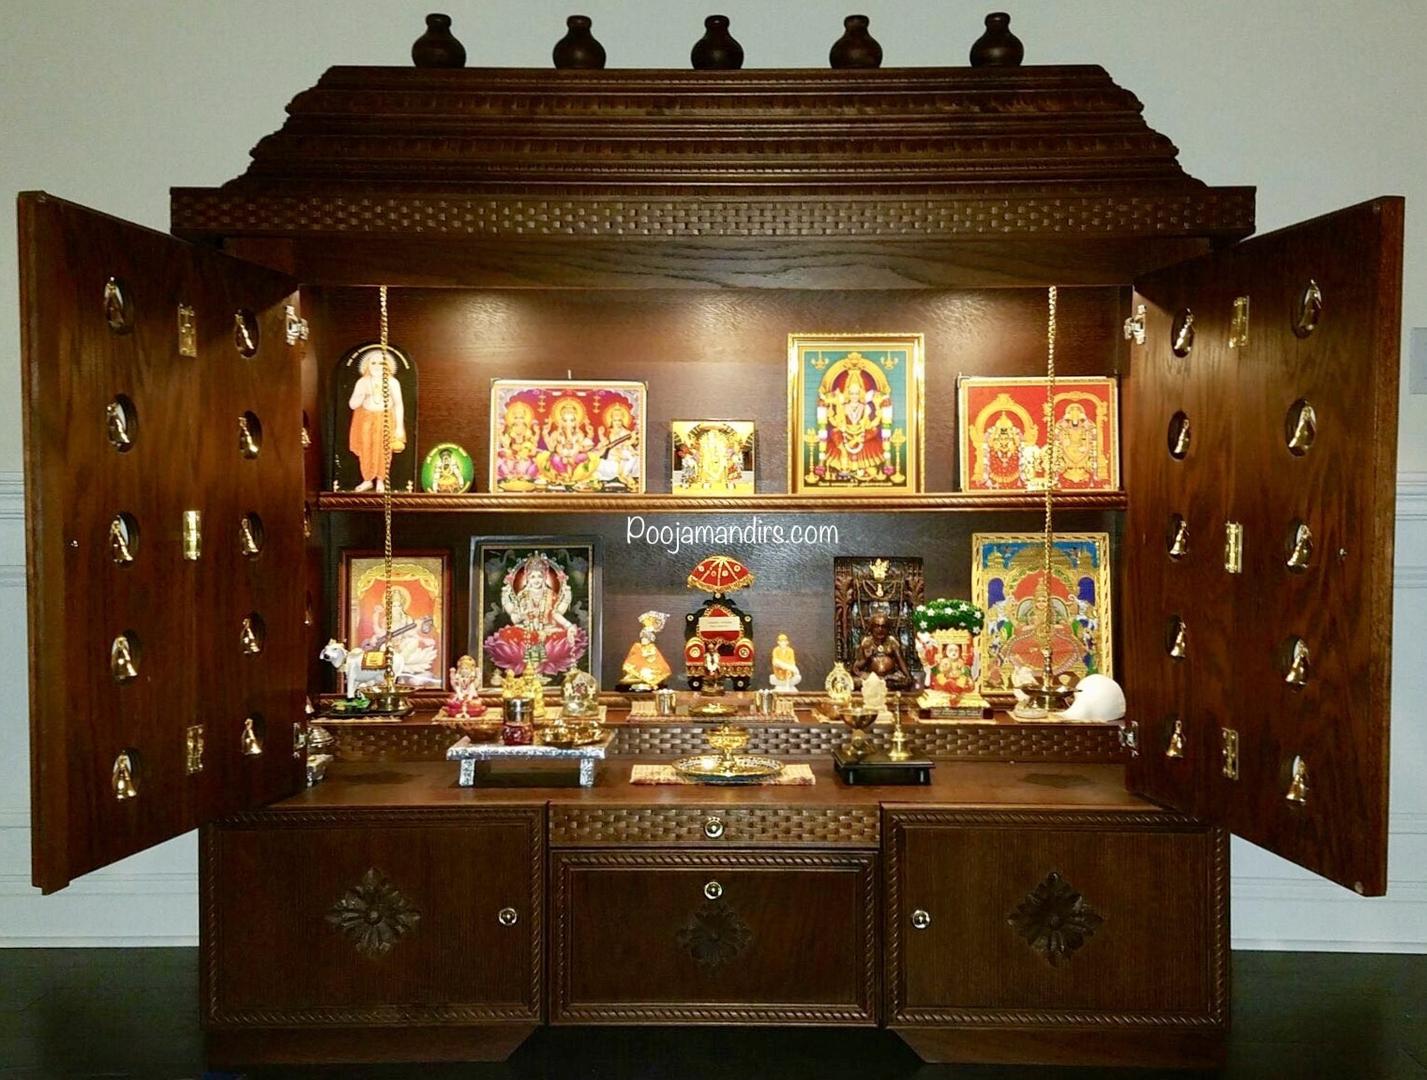 Pooja Mandirs USA - Chitra Collection - Closed Models